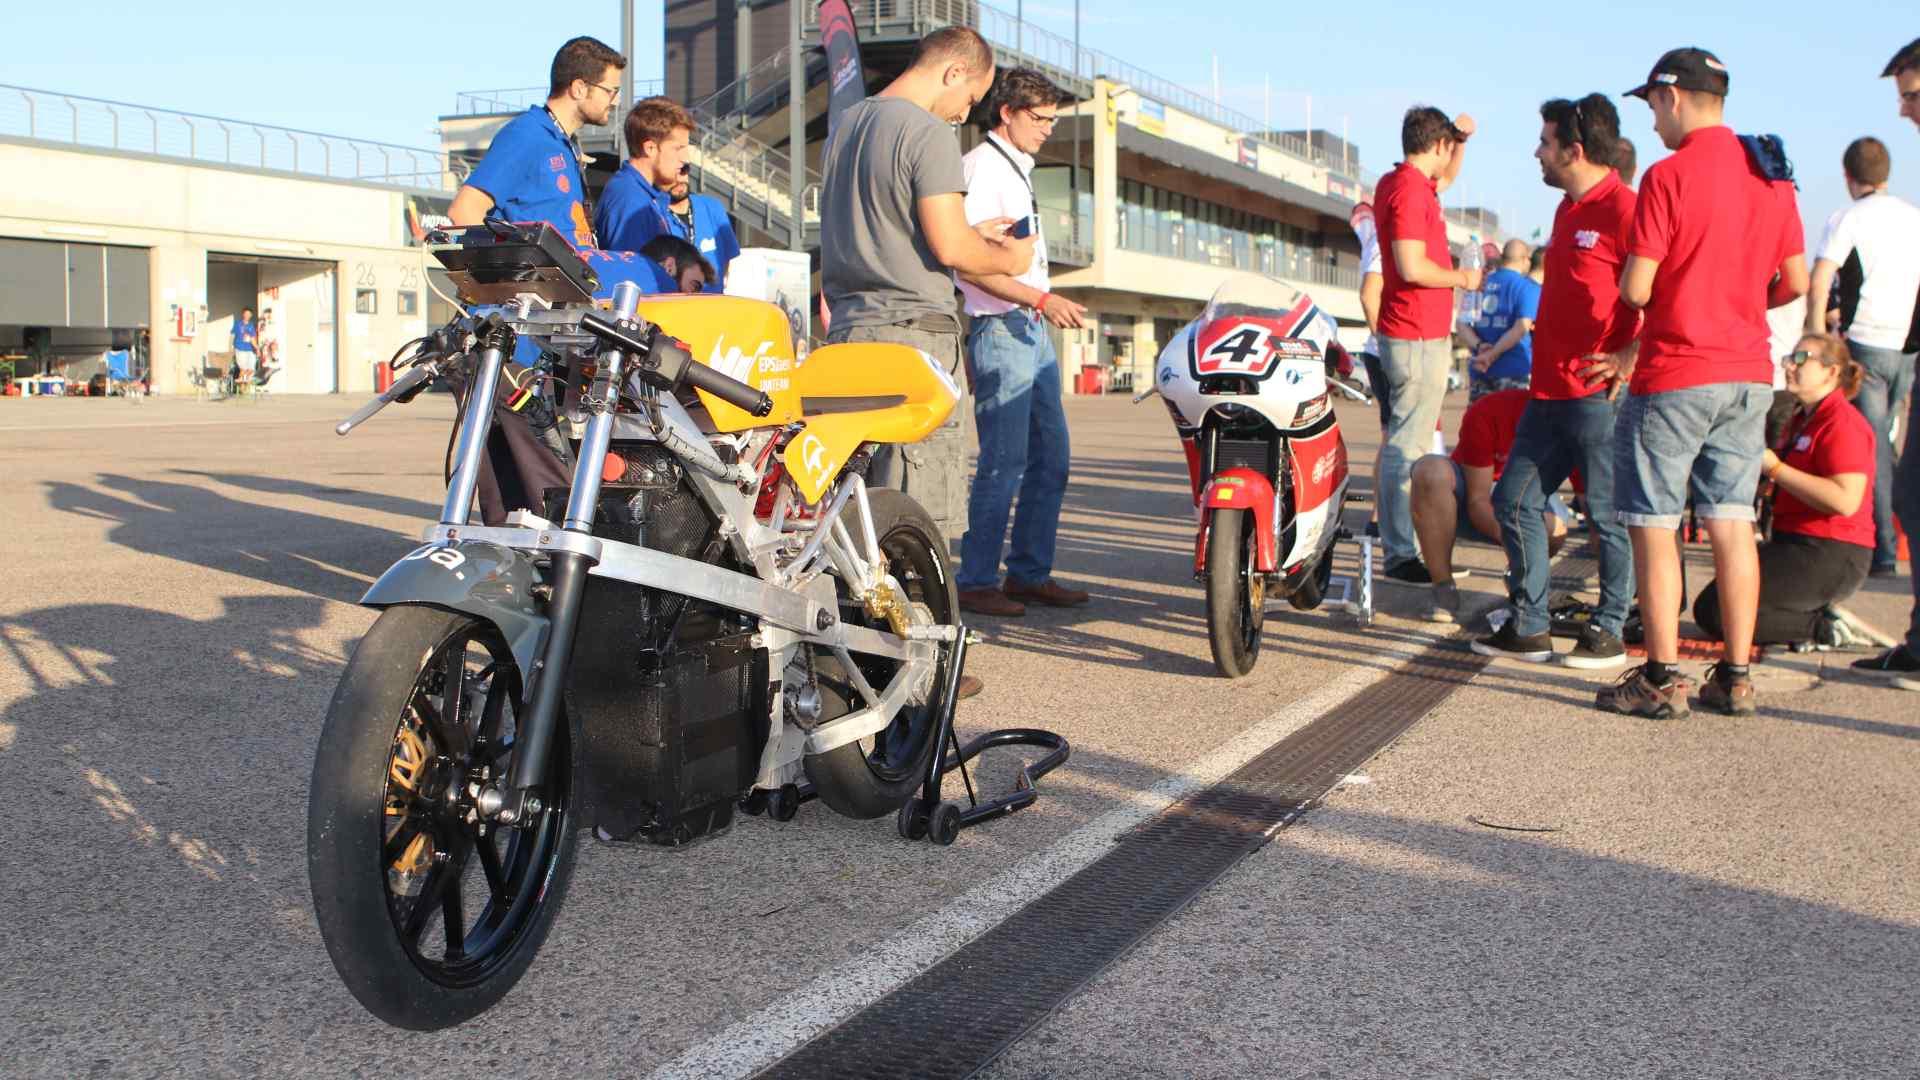 Arranca MotoStudent 2016 en MotorLand